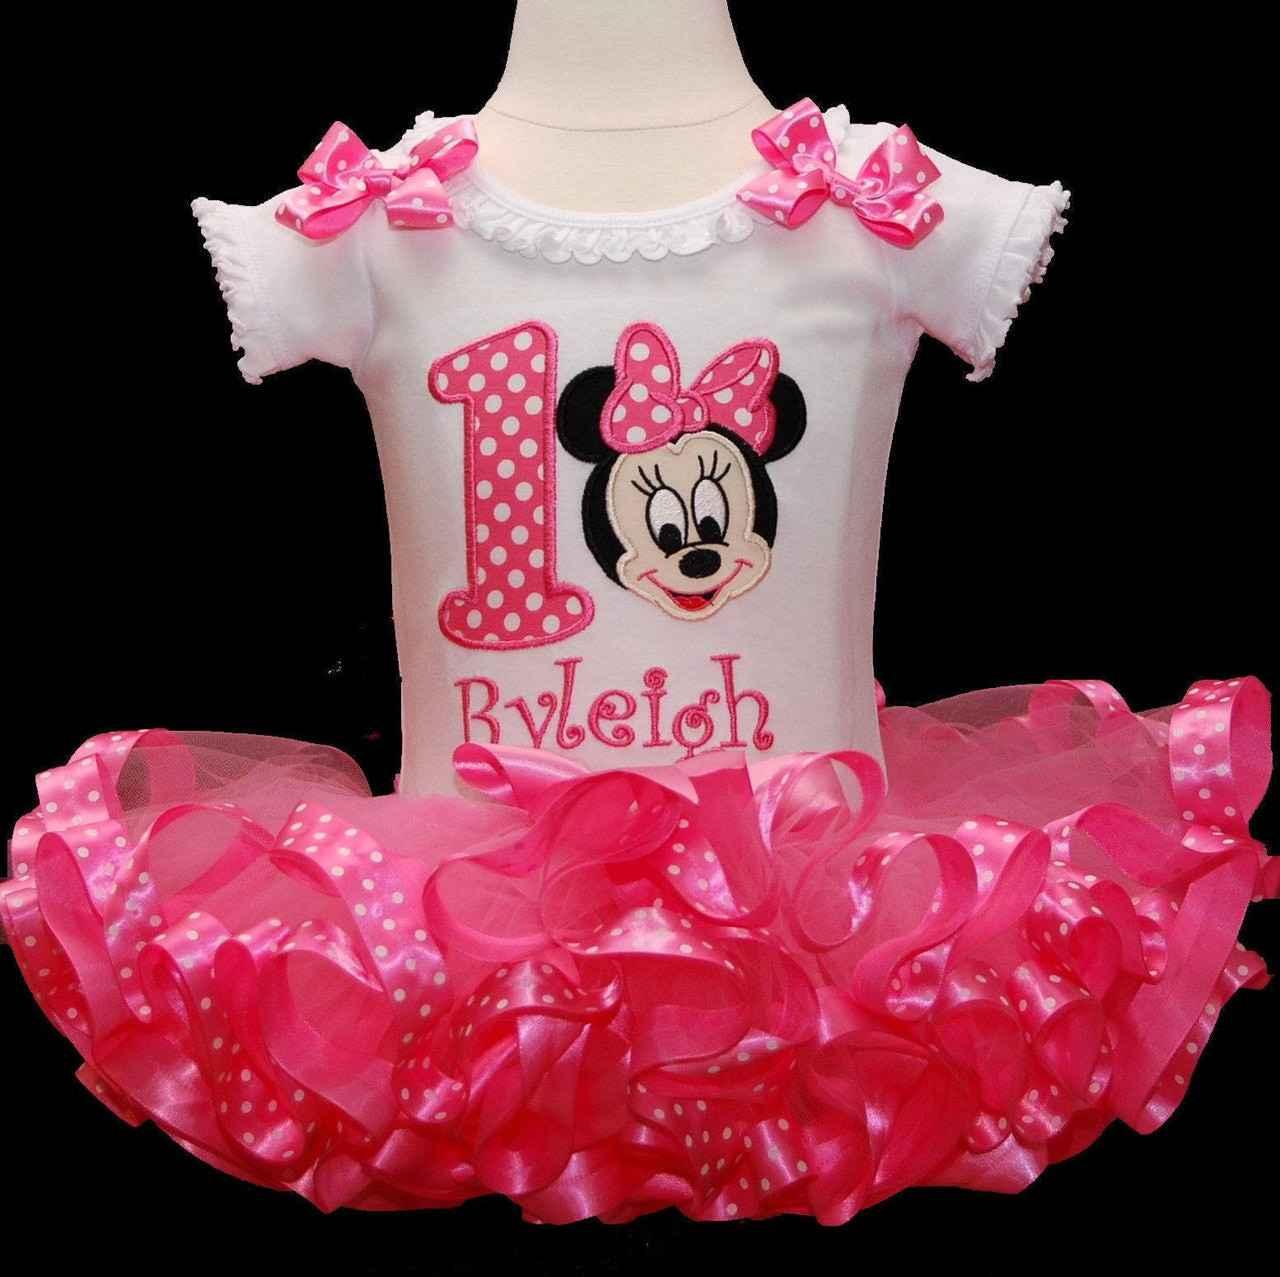 Minnie Mouse 1st Birthday Outfit, Baby Minnie Mouse tutu outfit, 1st birthday girl, cake smash outfit, birthday tutu dress ribbon trim